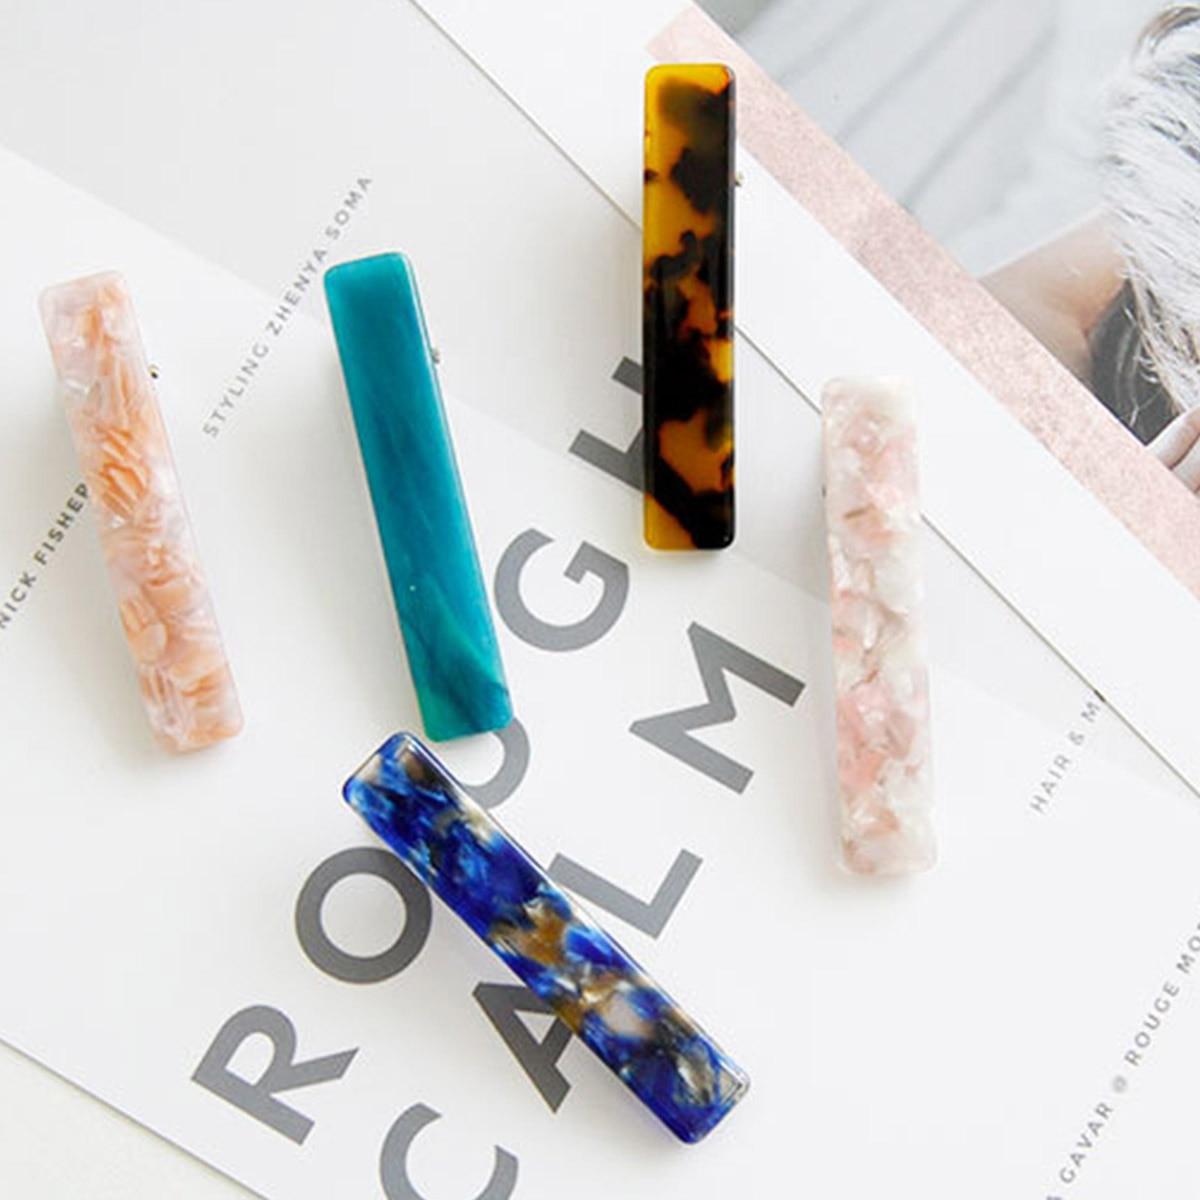 Hair Accessories Colorful Long Acrylic Hair Clips For Women Girls Rectangle Marble Leopard Pattern Headwear Barrette Headband